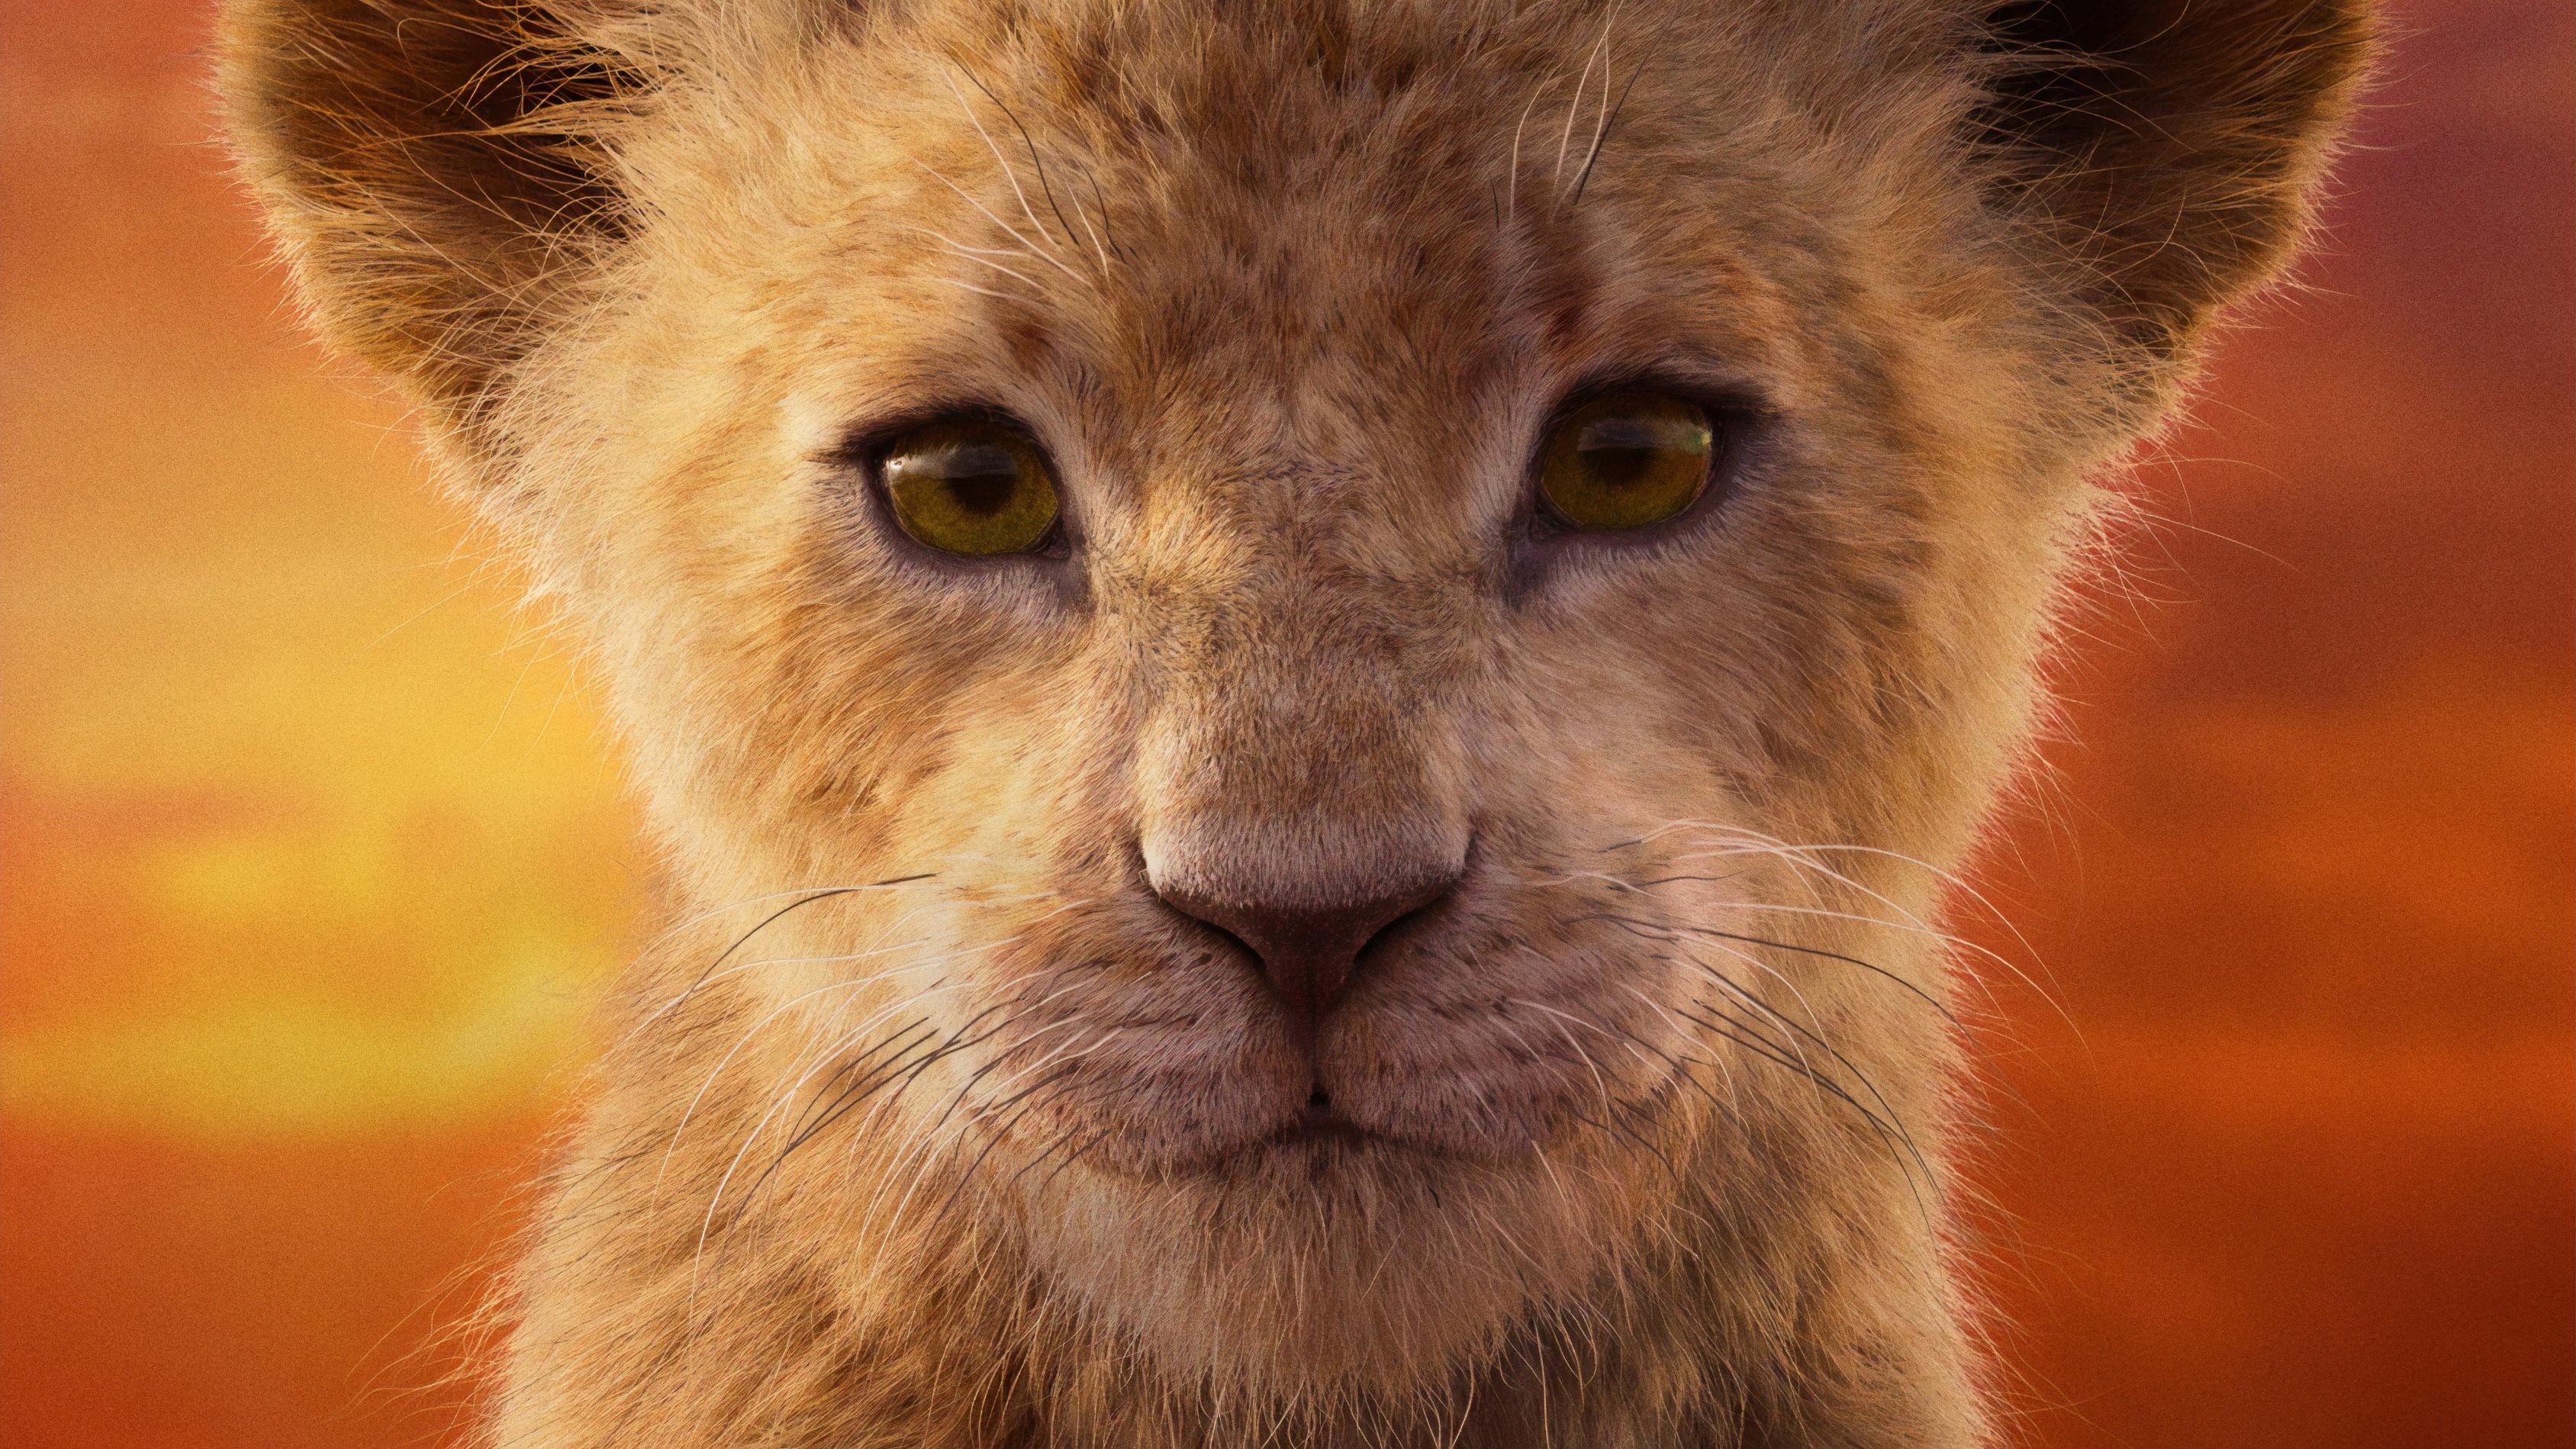 Shahadi Wright Joseph As Nala The Lion King 2019 4k, HD